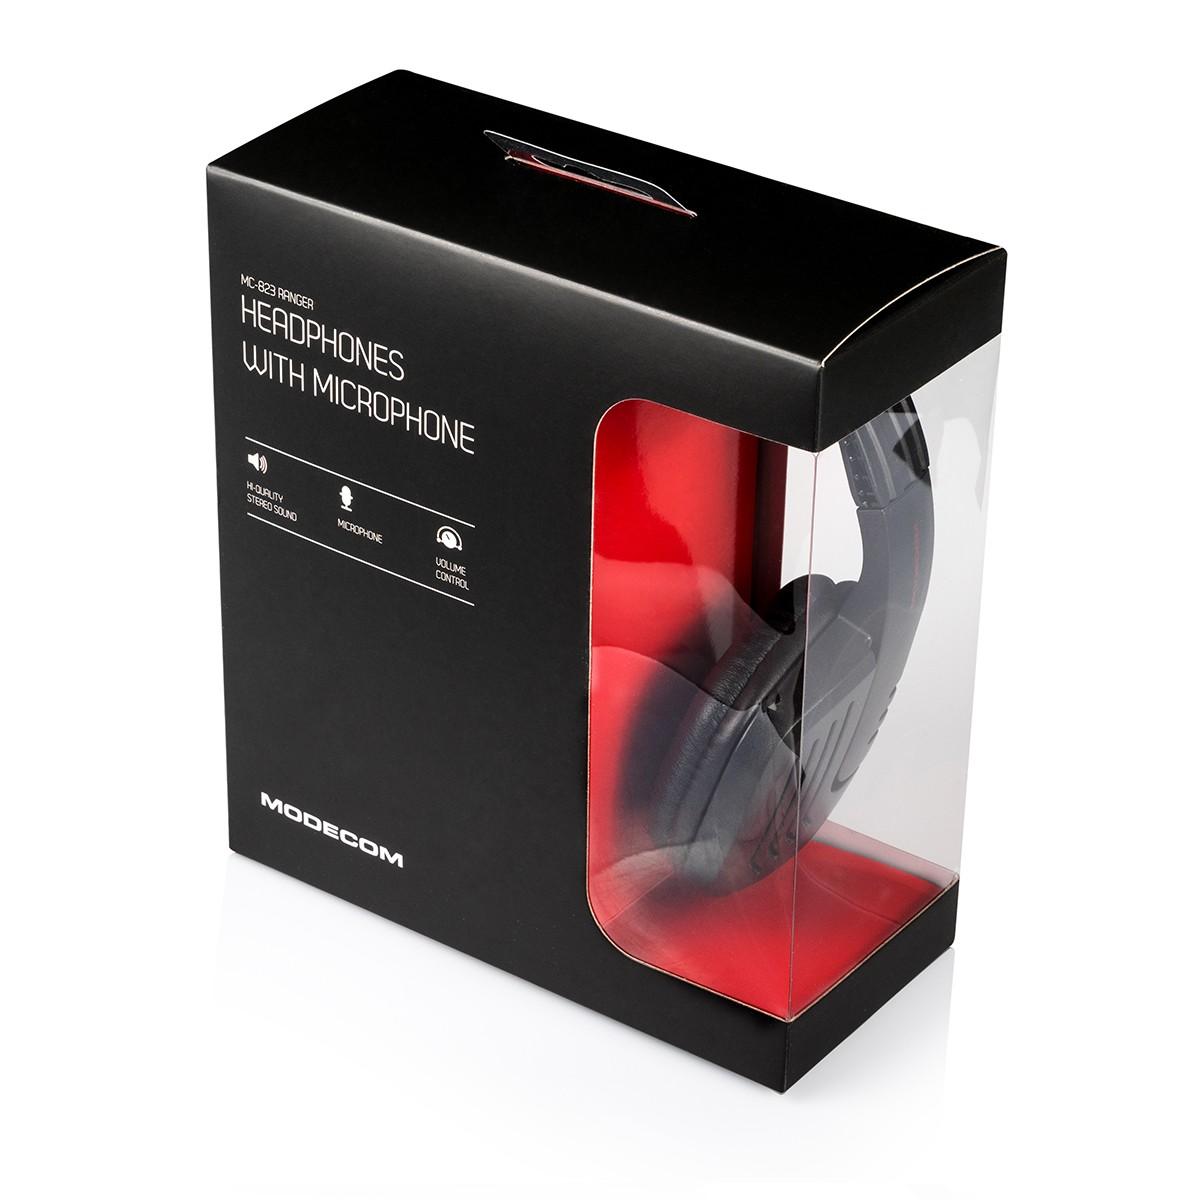 MODECOM RANGER MC-823 Black/Red gamers headphones